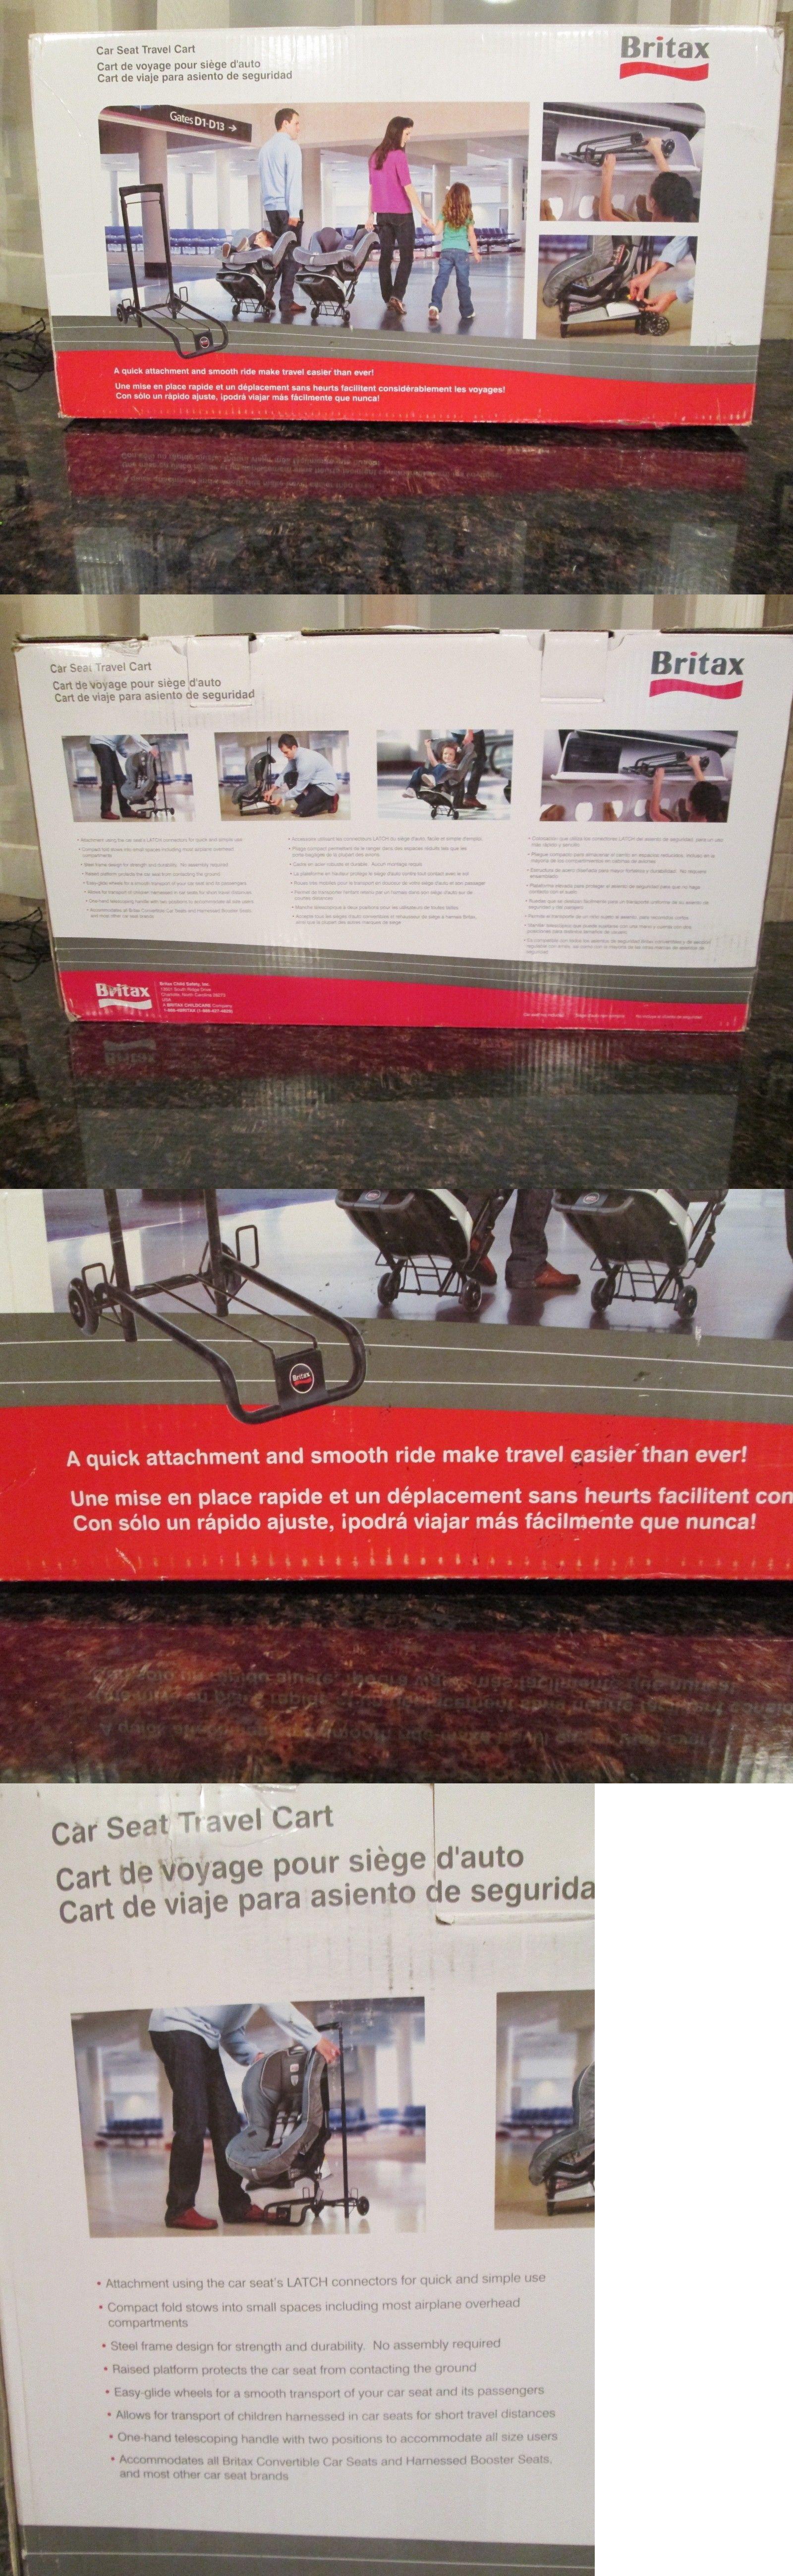 Car Seat Accessories 66693 Britax Travel Cart Brand New In Box